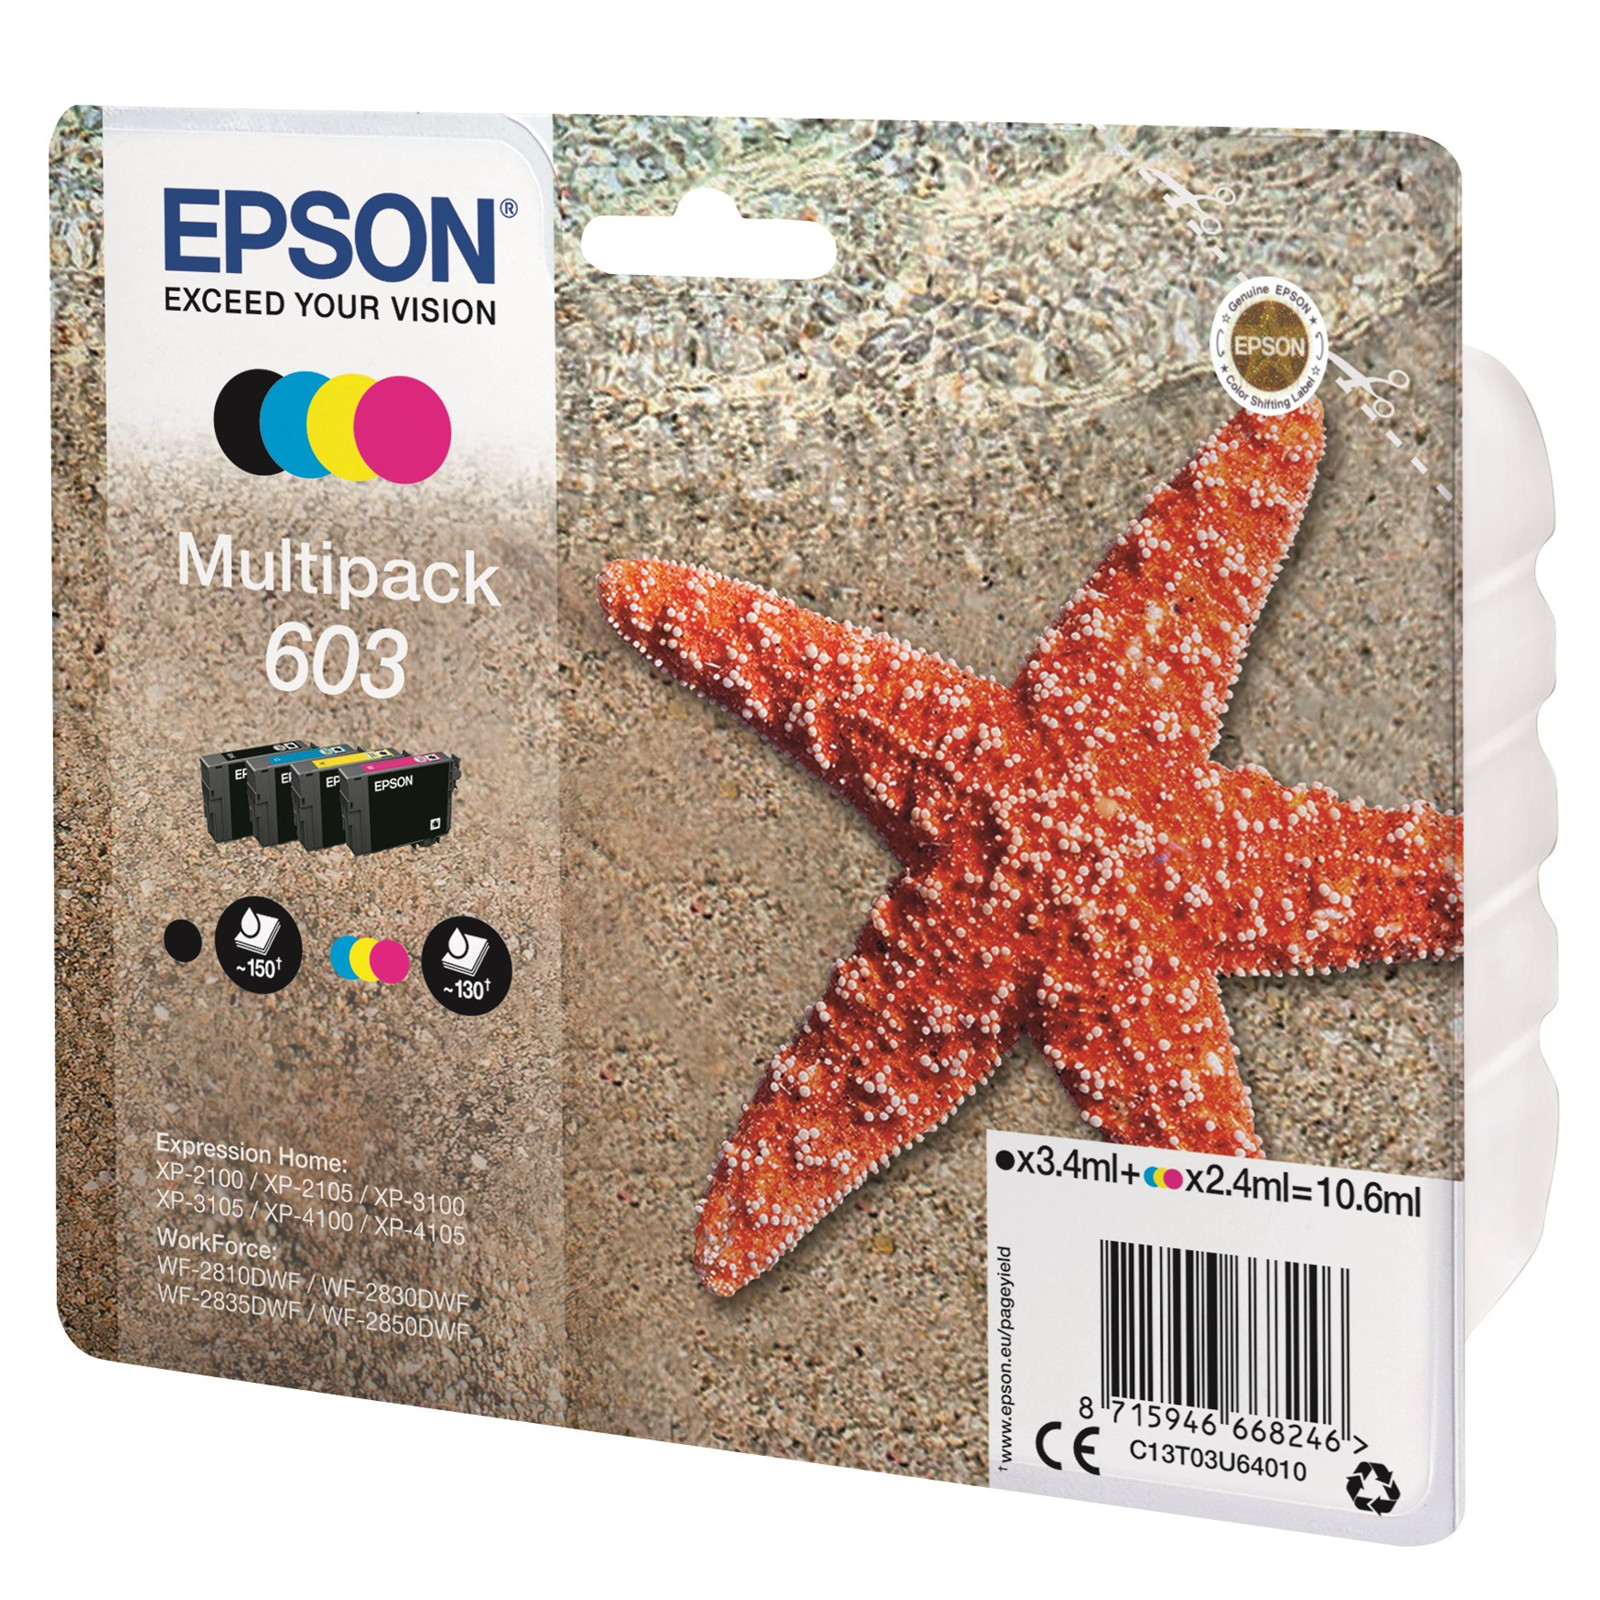 Epson T03U Multipack 4-colours 603 Ink Cartridge